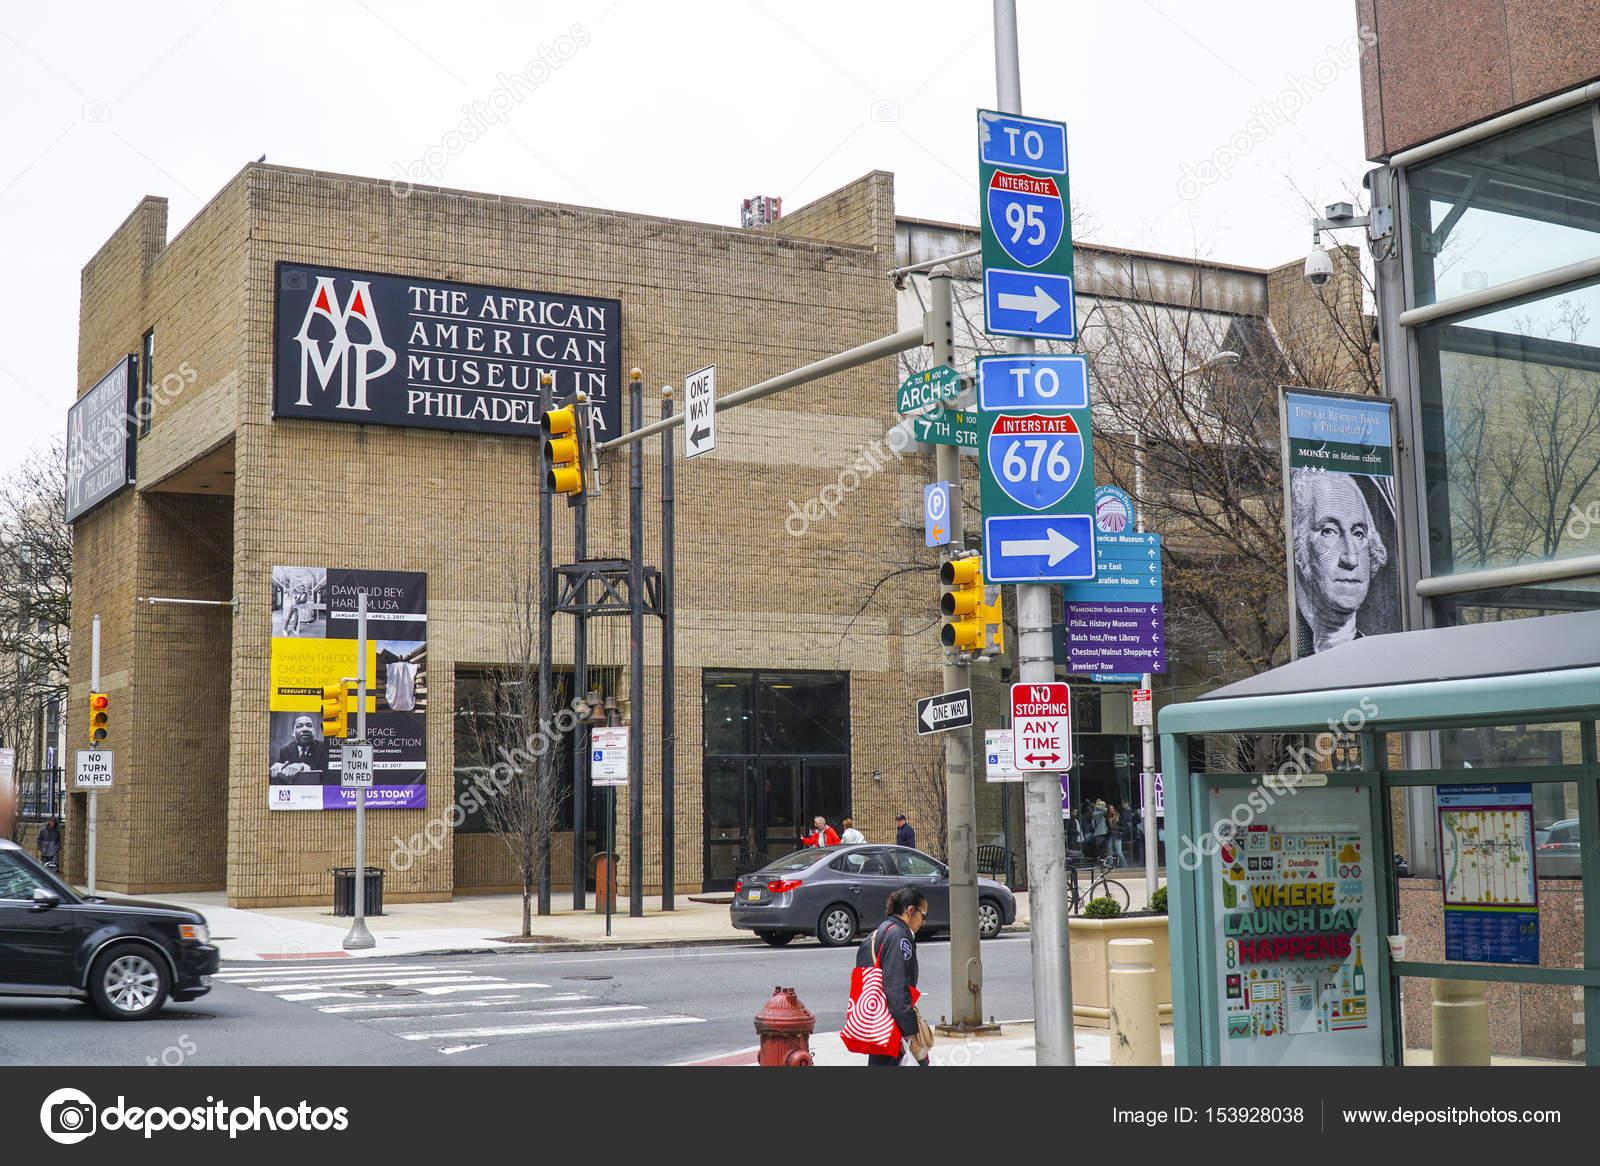 The African American Museum In Philadelphia Philadelphia